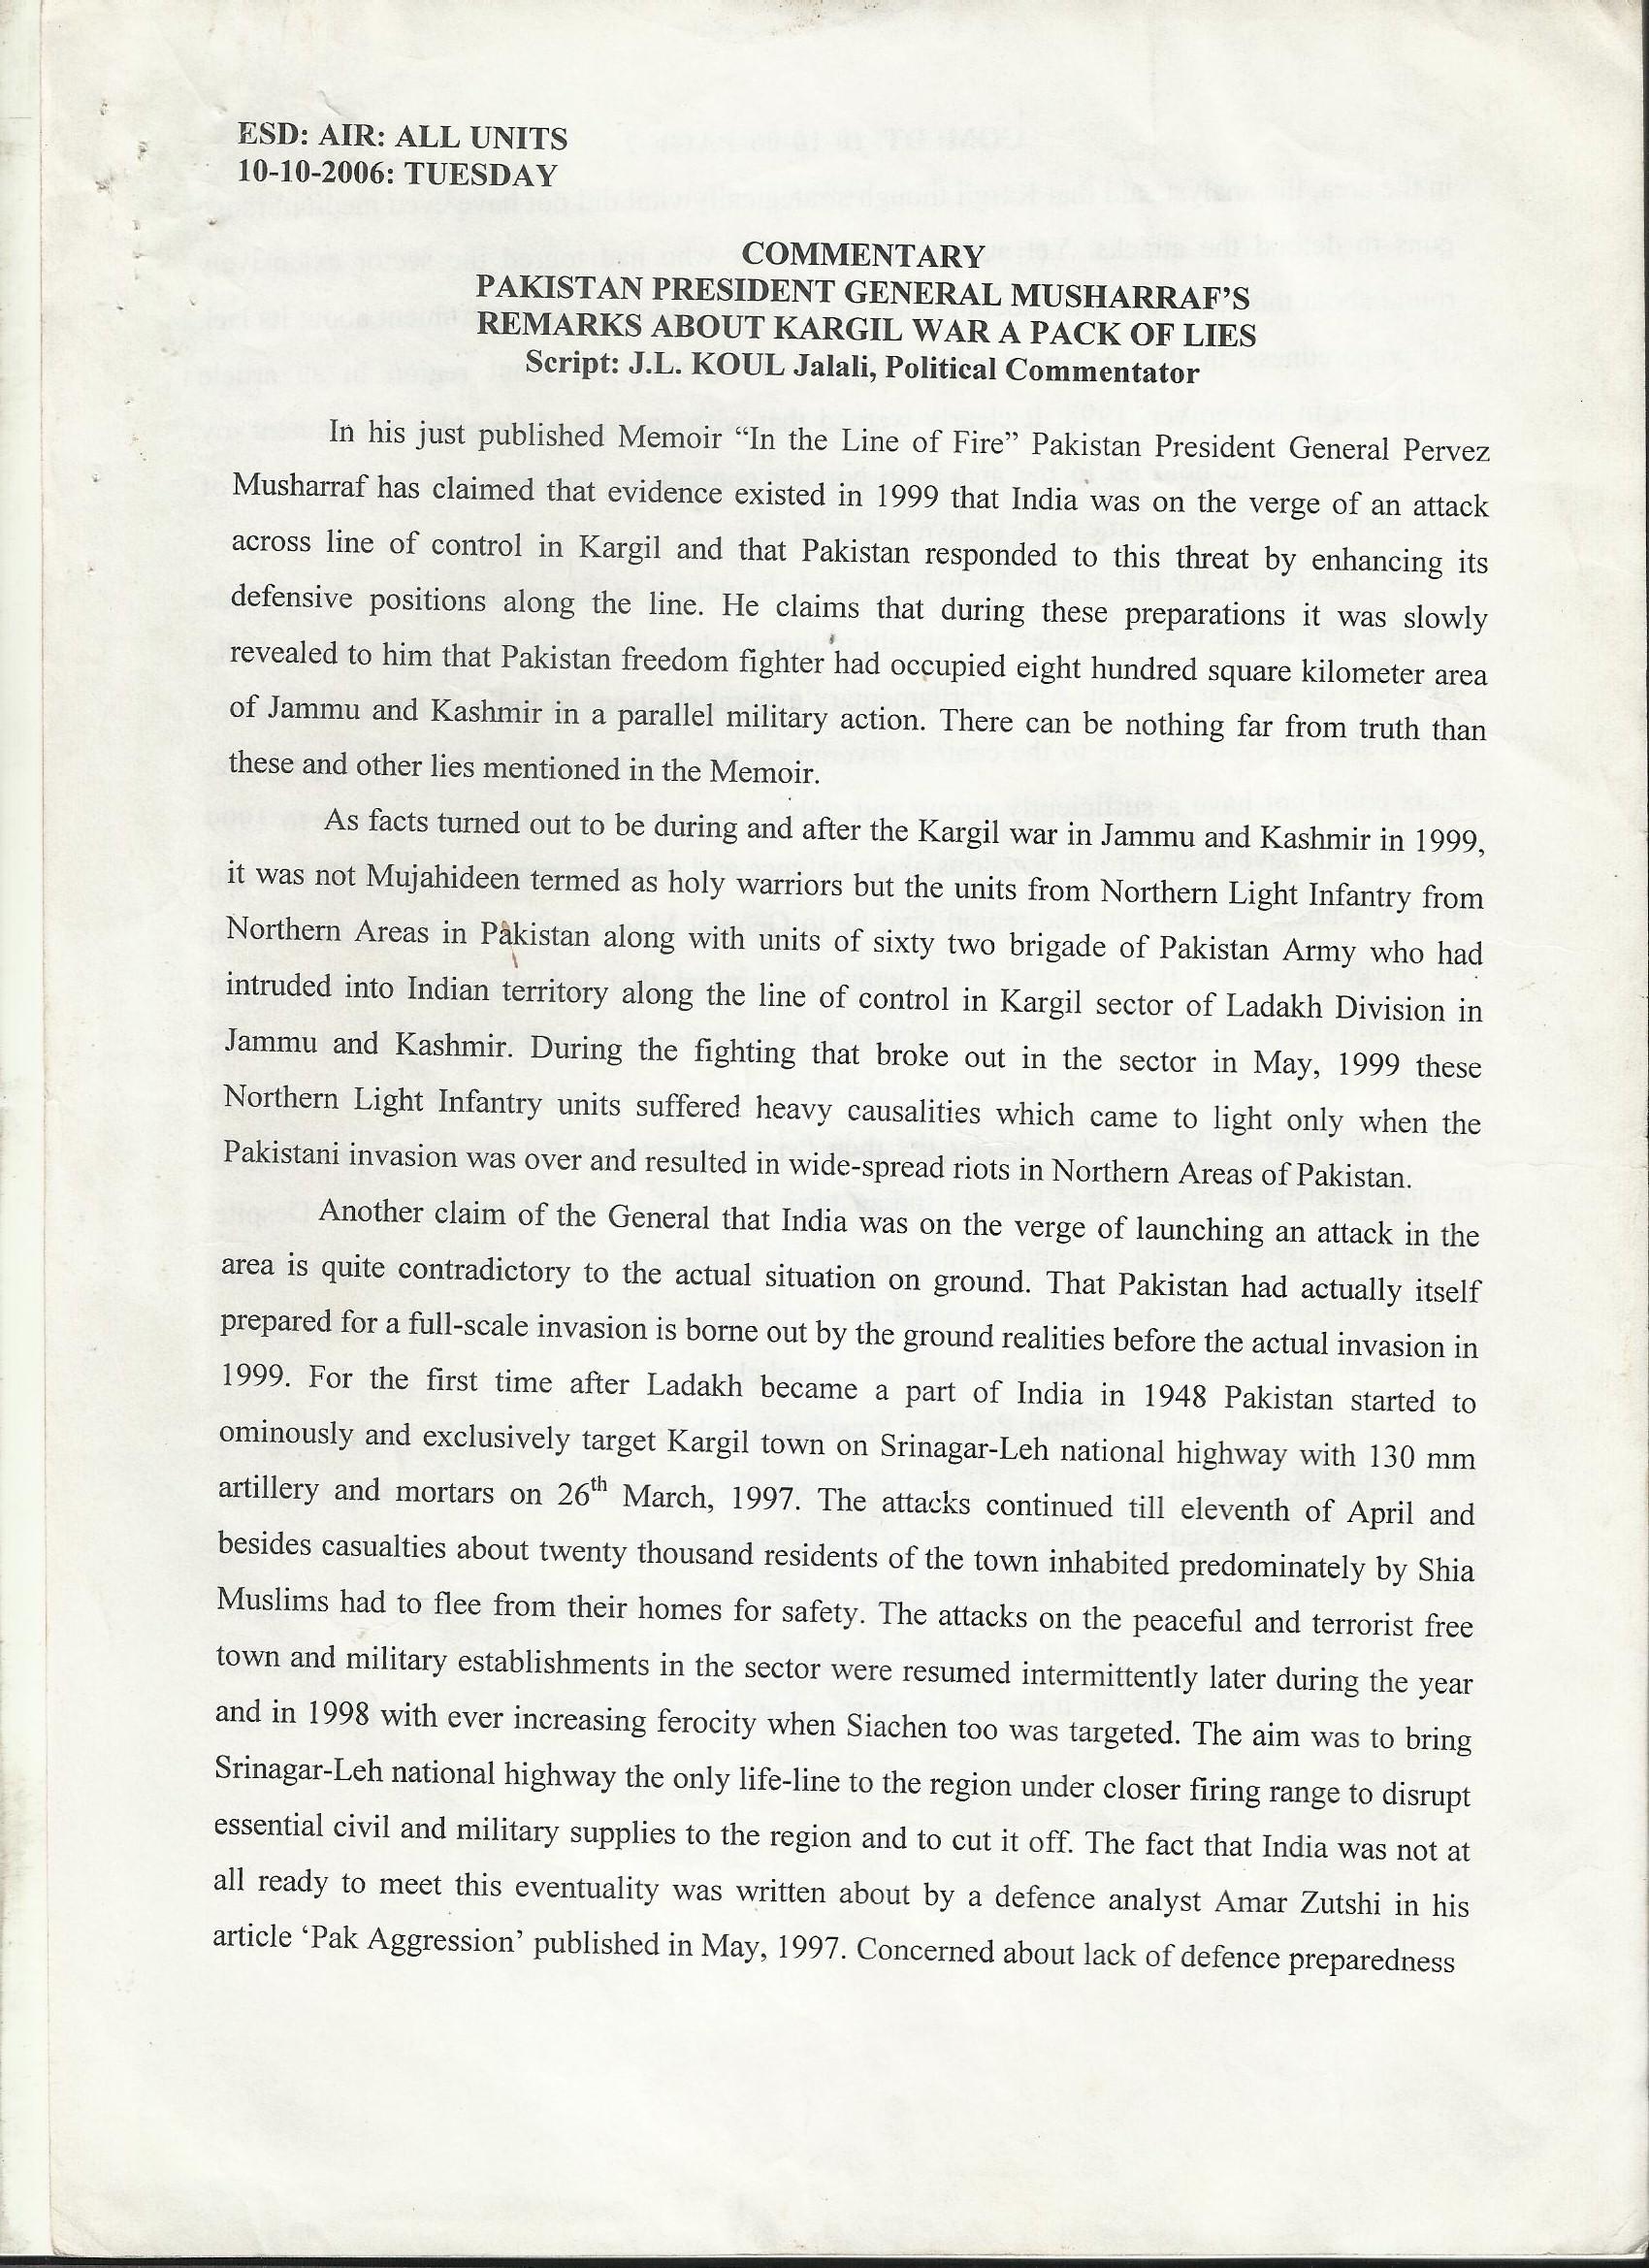 46)- FORMER PAK PRESIDENT'S DECEPTION ON KARGIL(Date of